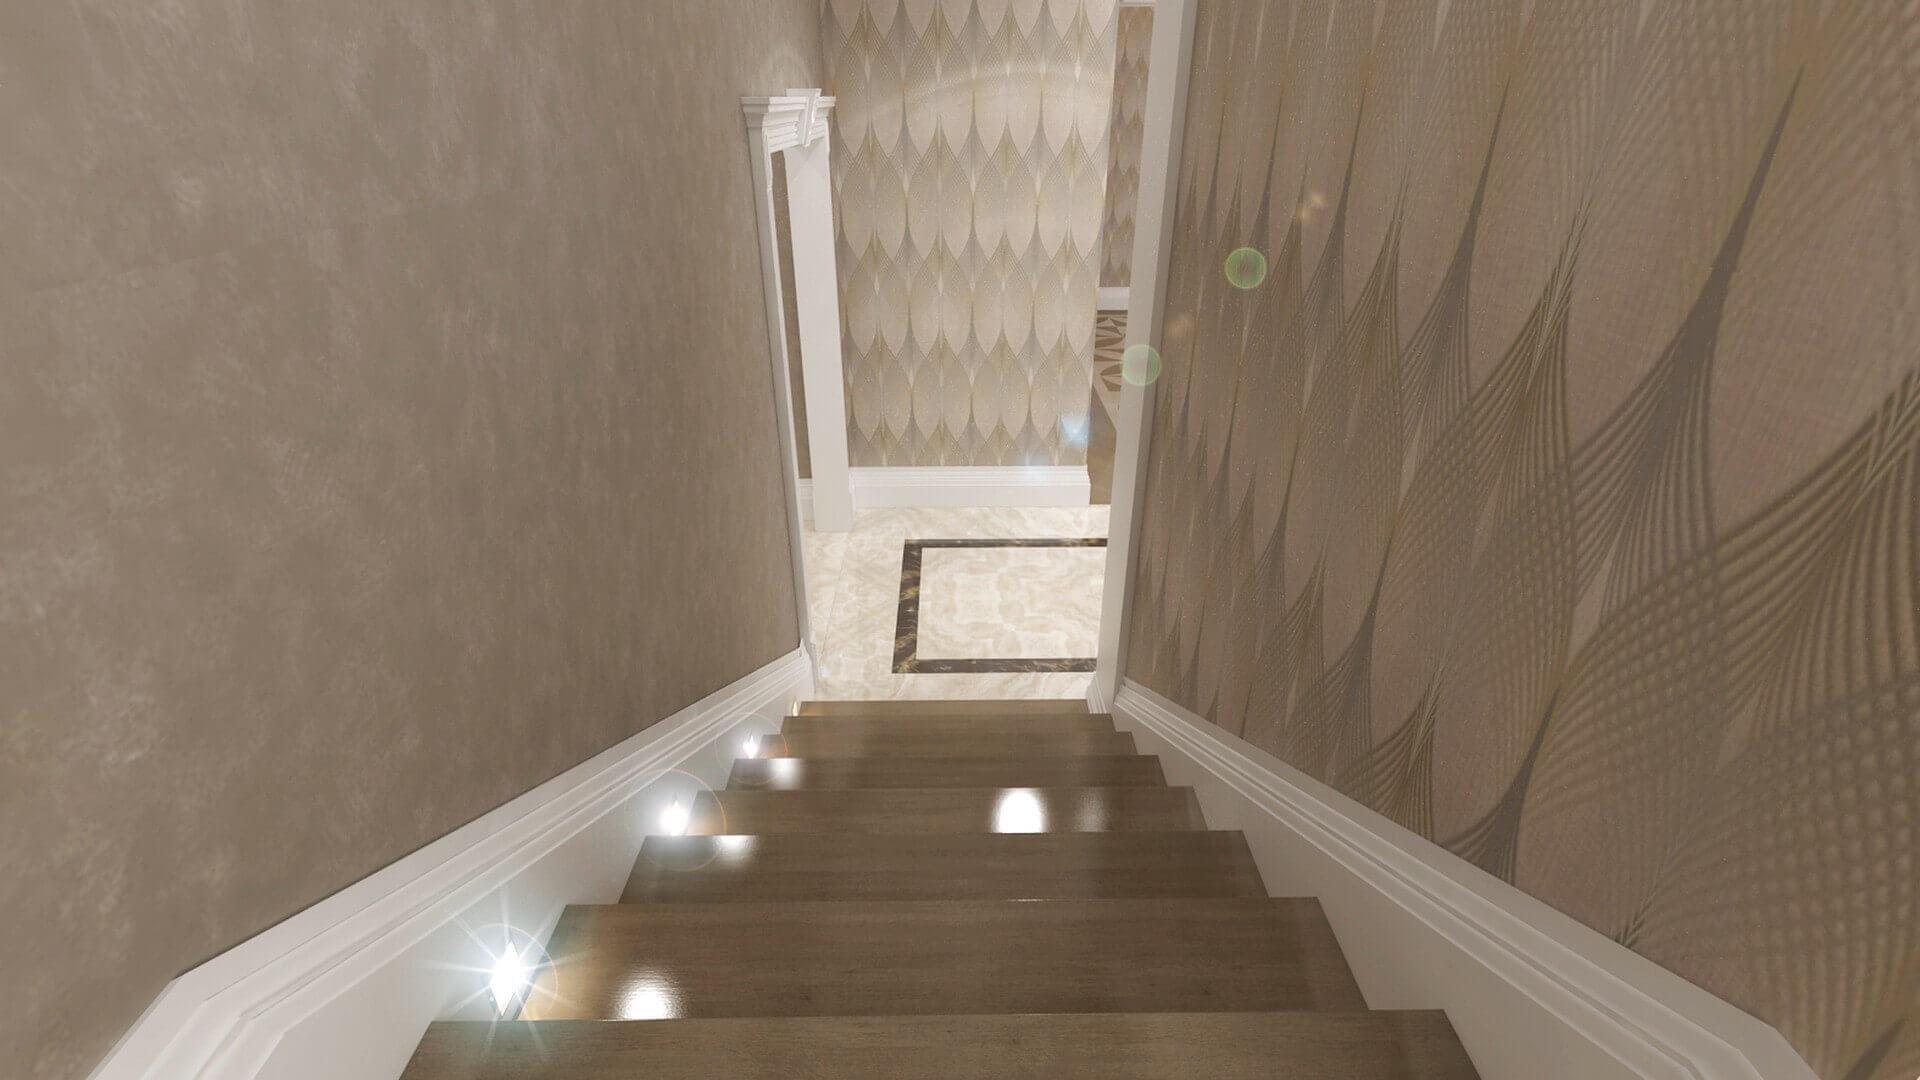 Ankara villa projeleri 2841 Özel Proje Konutlar